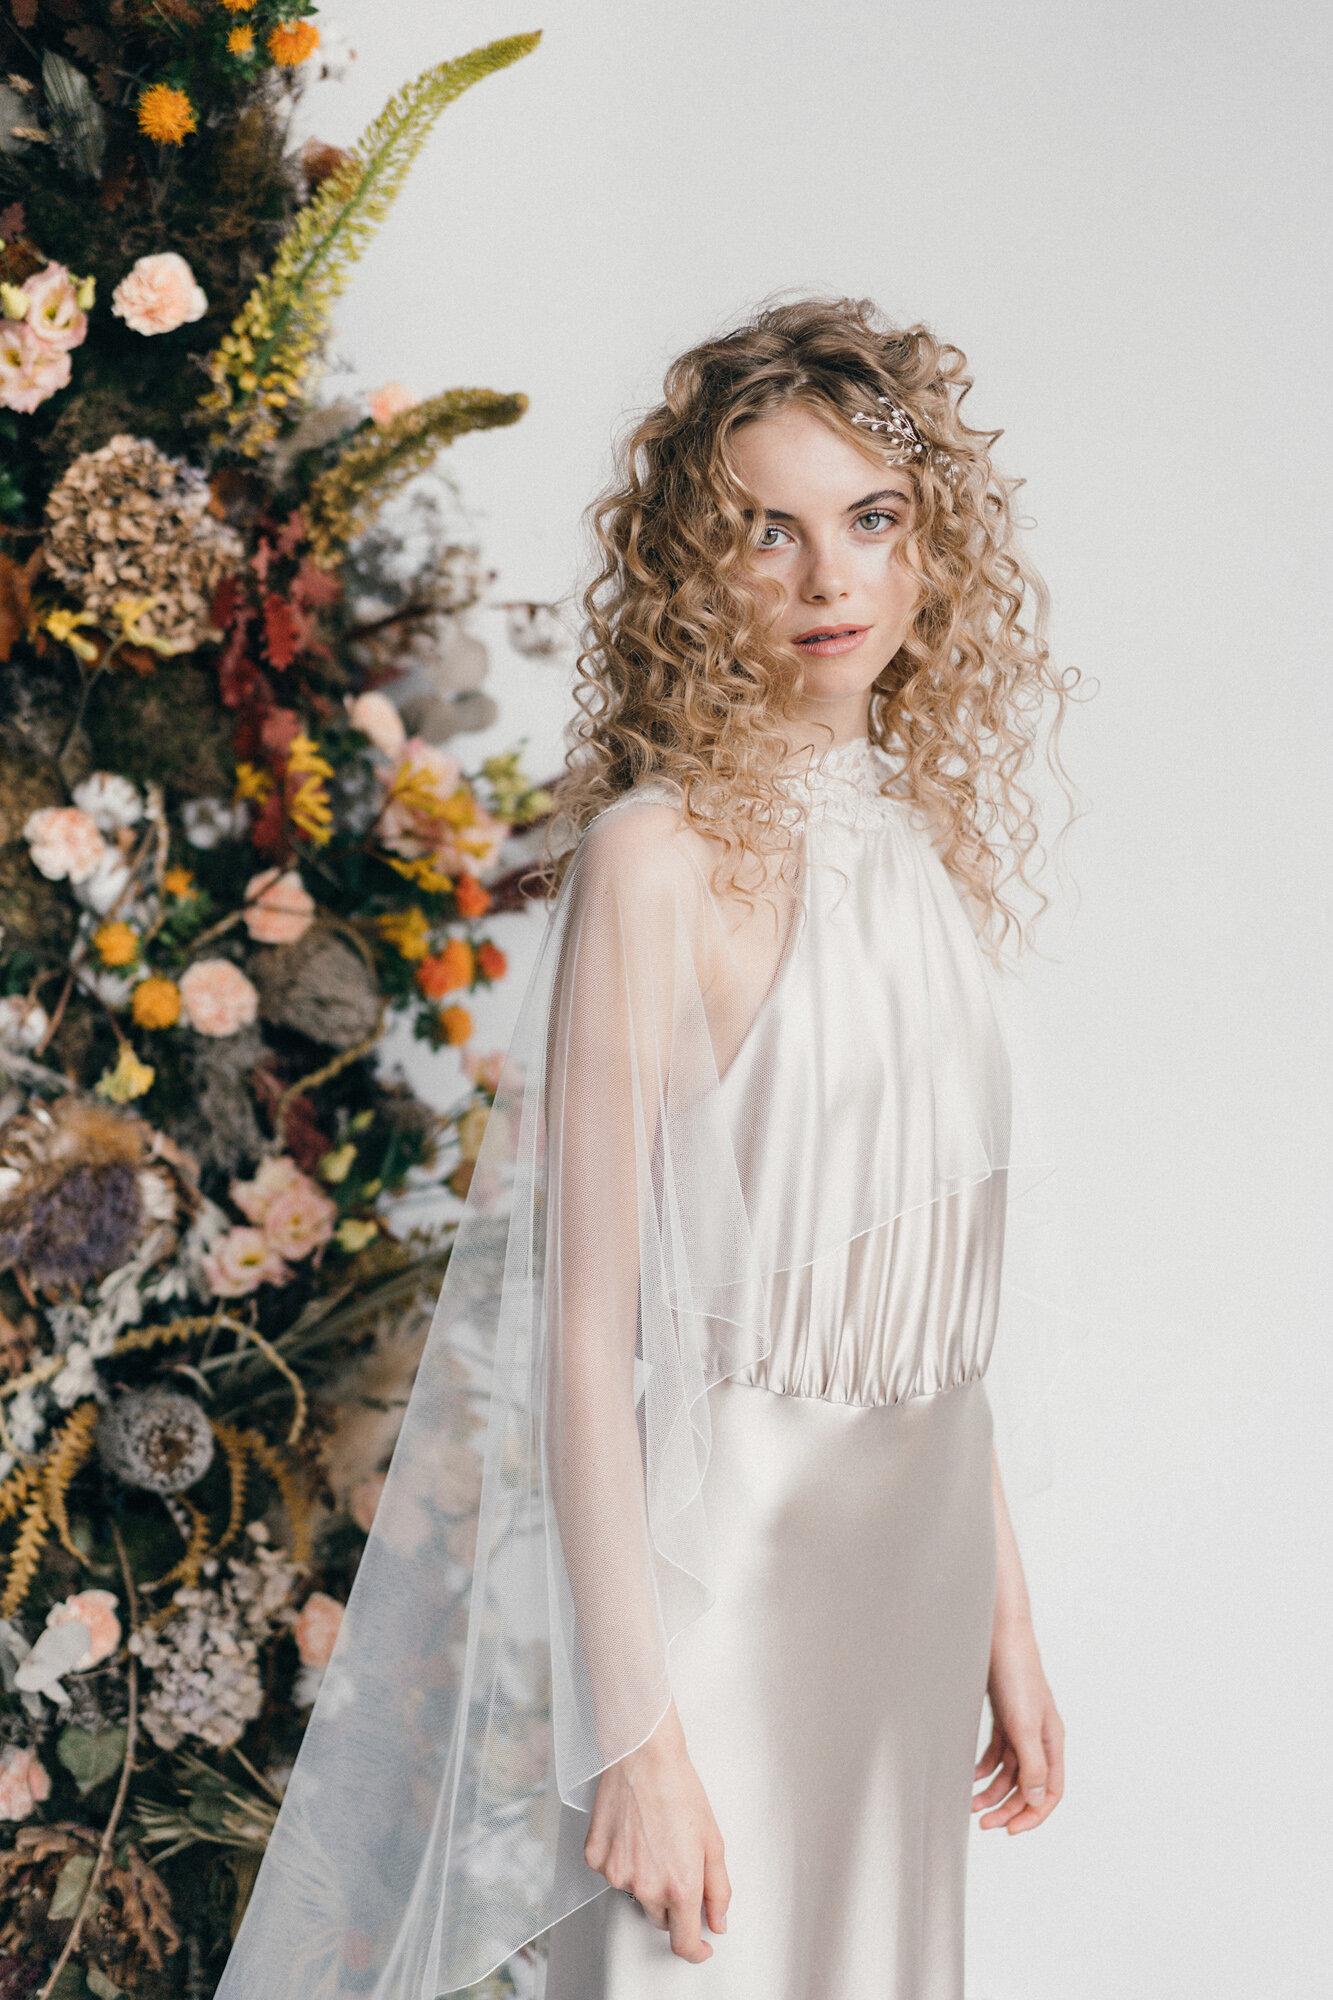 Debbie-Carlisle-Bridal-Accessories-Kate-Beaumont-Wedding-Gowns-Sheffield-Yorkshire-UK-11.jpg